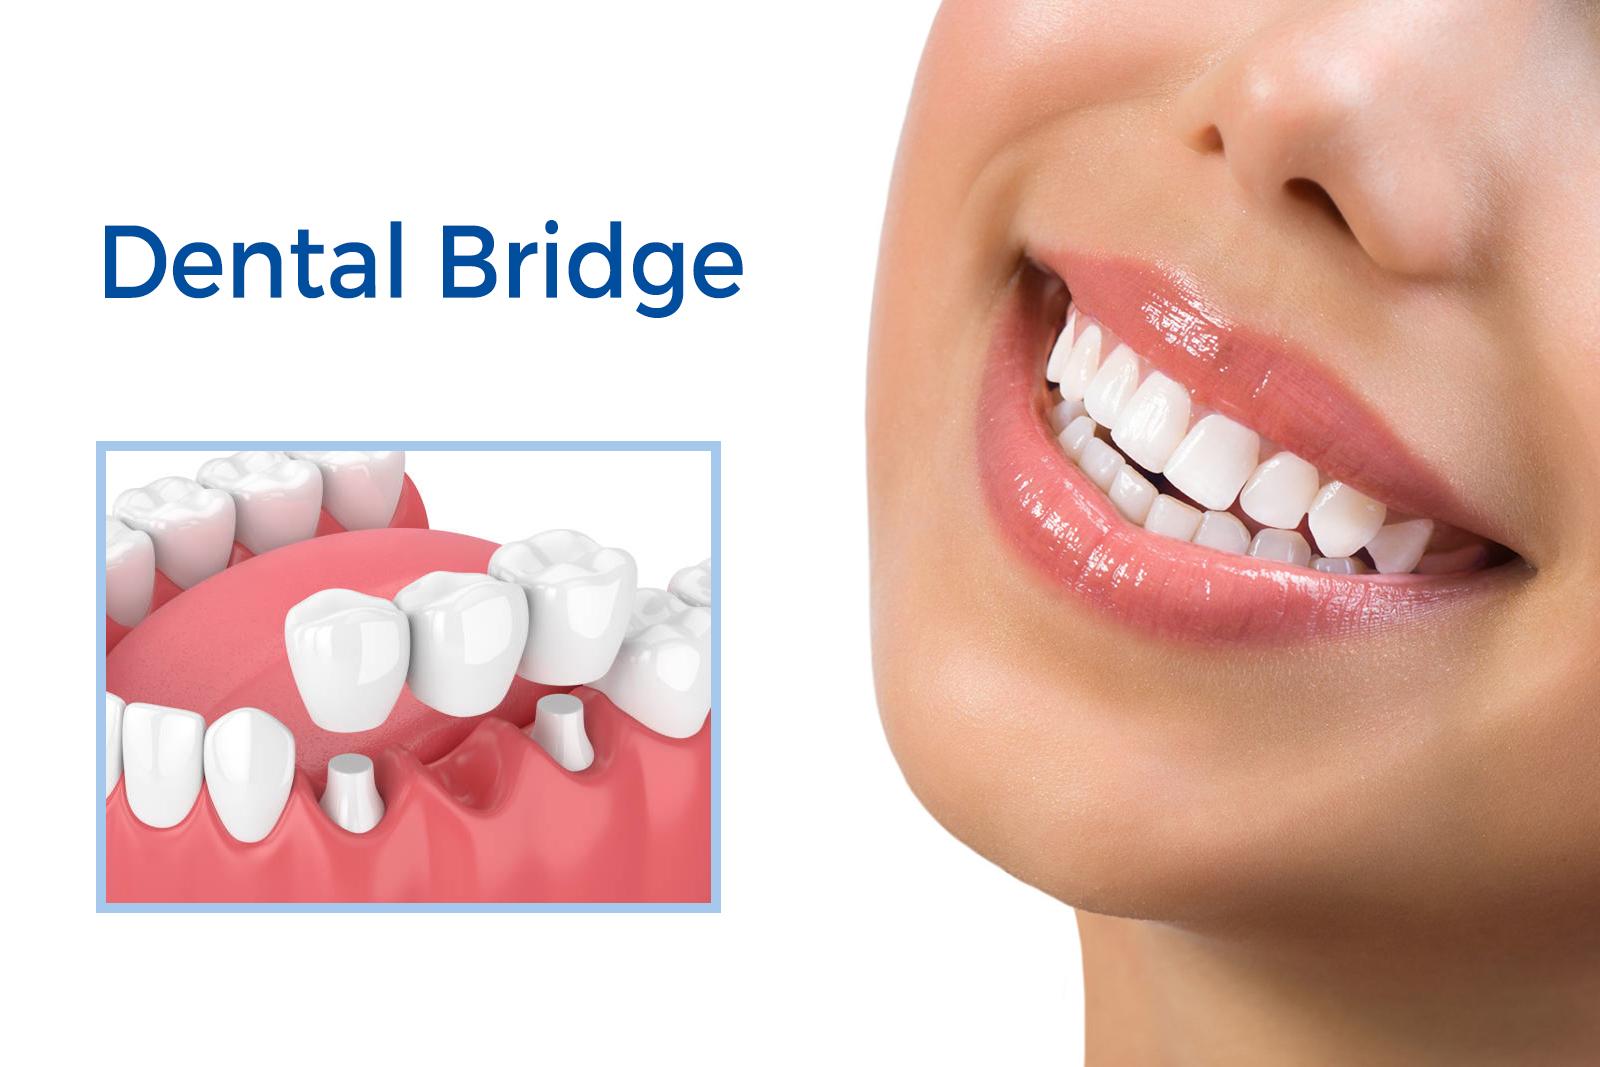 Reasons why dental implant bridges are better than dentures